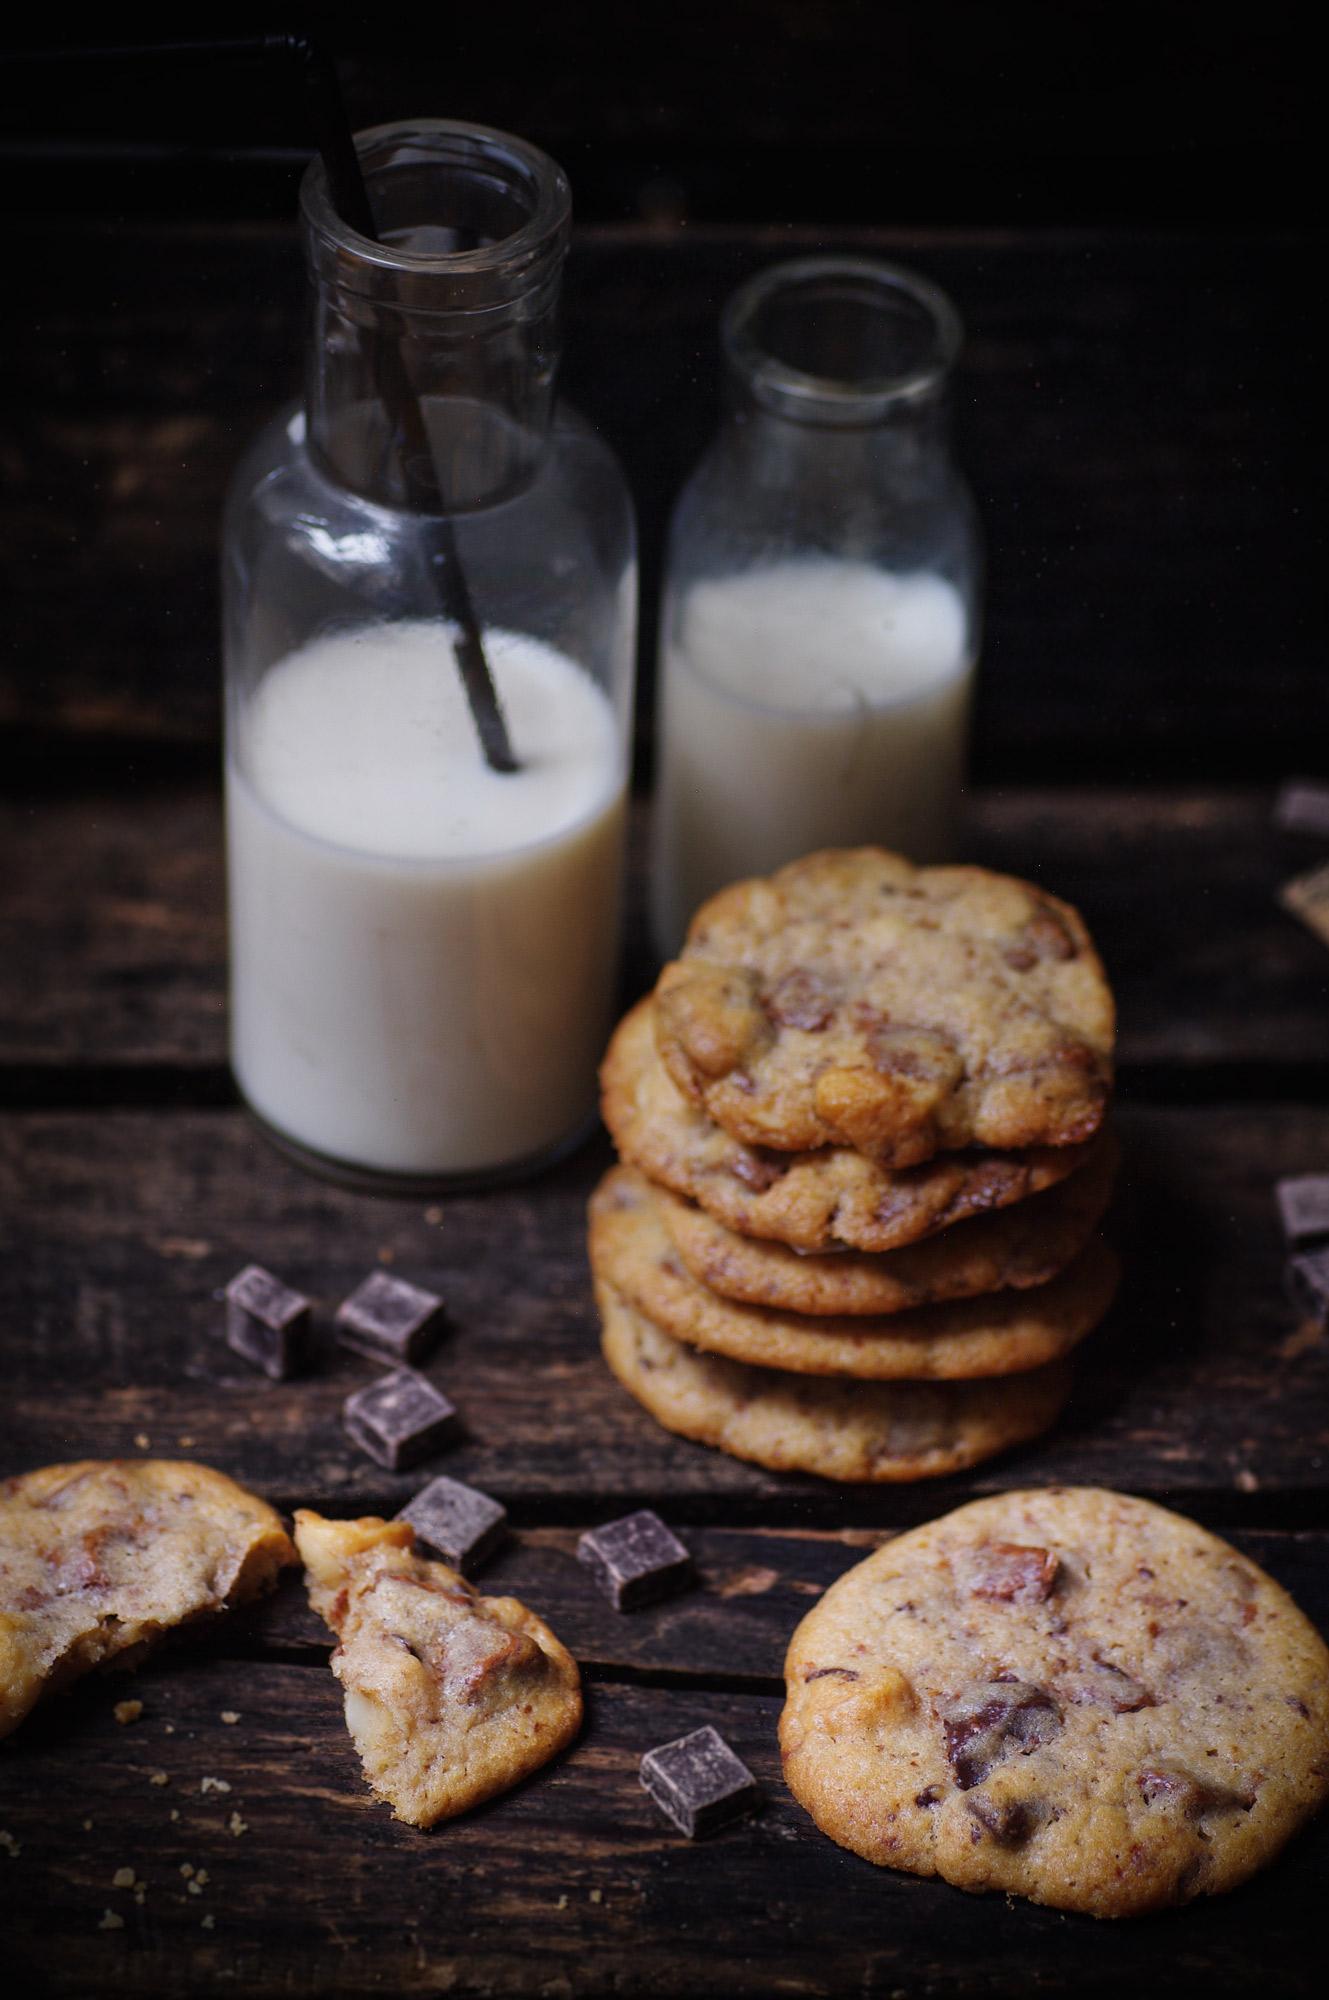 dessert, praliné, pralin , noisette, chocolat, easy, recette, recipe, blogger, chocolate, hazelnut, almond, sweet,chef, blogger, cooking, cake , leger , gateau , light, chabath , shabath , parvé, dairyfree, sans lactoses , bread, homemade, freshly baked, recipe, pain , pain de mie, loaf, MAP, recette, blog, blogger, donut, beignet, hannouca, doughnut, hanouka, sucre, chocolate mousse, creamy, foamy, light, fluffy, airy, chocolate, sweet, vegan, recipe, light, healthy, gluten free, chocolat, recite, kosher, kasher, cacher, dessert, sucré, facile, rapide, quick, easy, passover, pessah, pace, kosher , kasher, milk chocolate, chocolat au lait, fondant, cake, chocolate cake, cake au chocolat, parve, parvé; cookies ; chocolate chunk